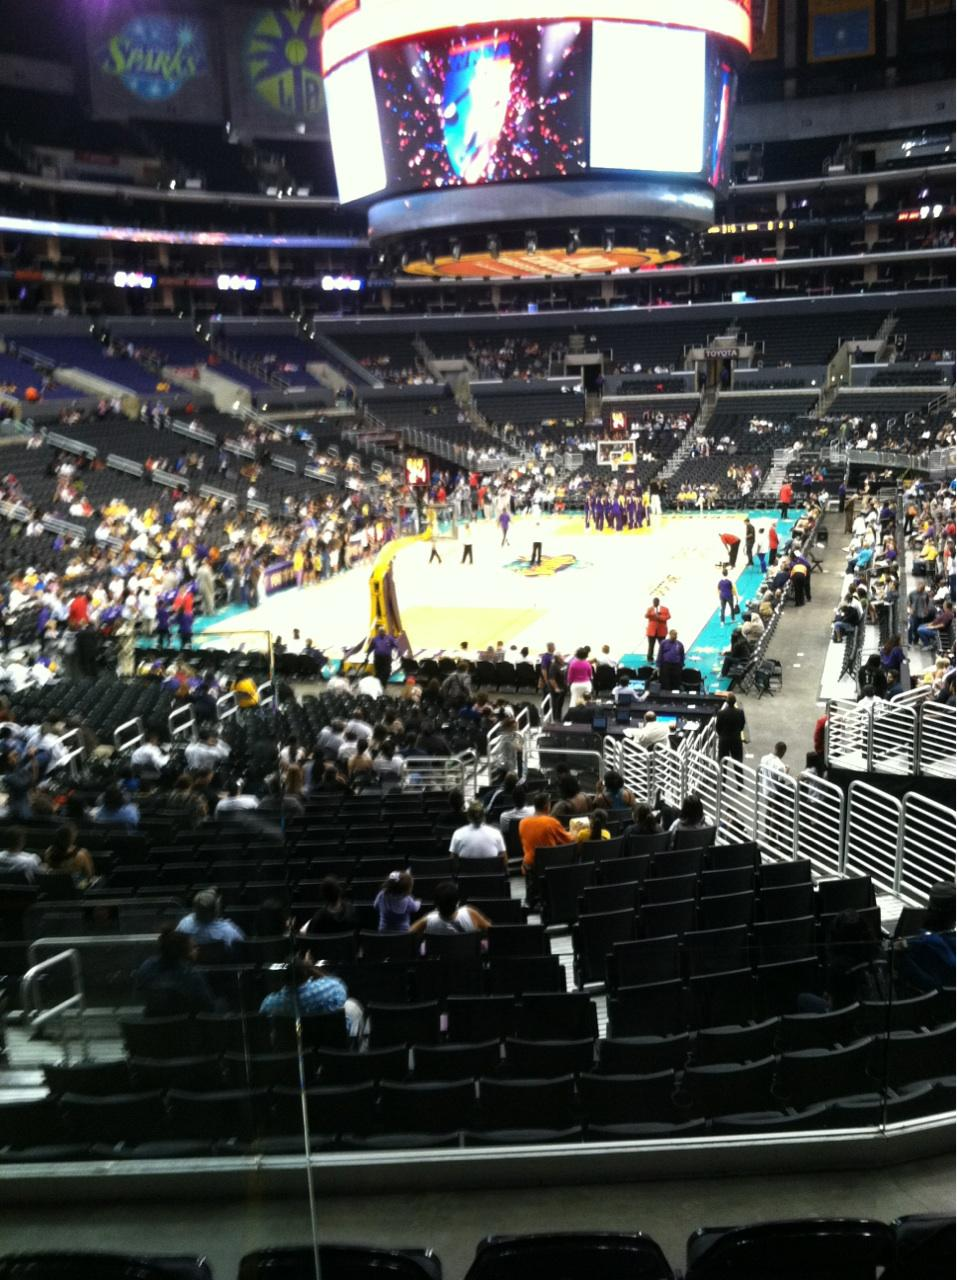 Staples Center Section 215 Staples Center Section 215